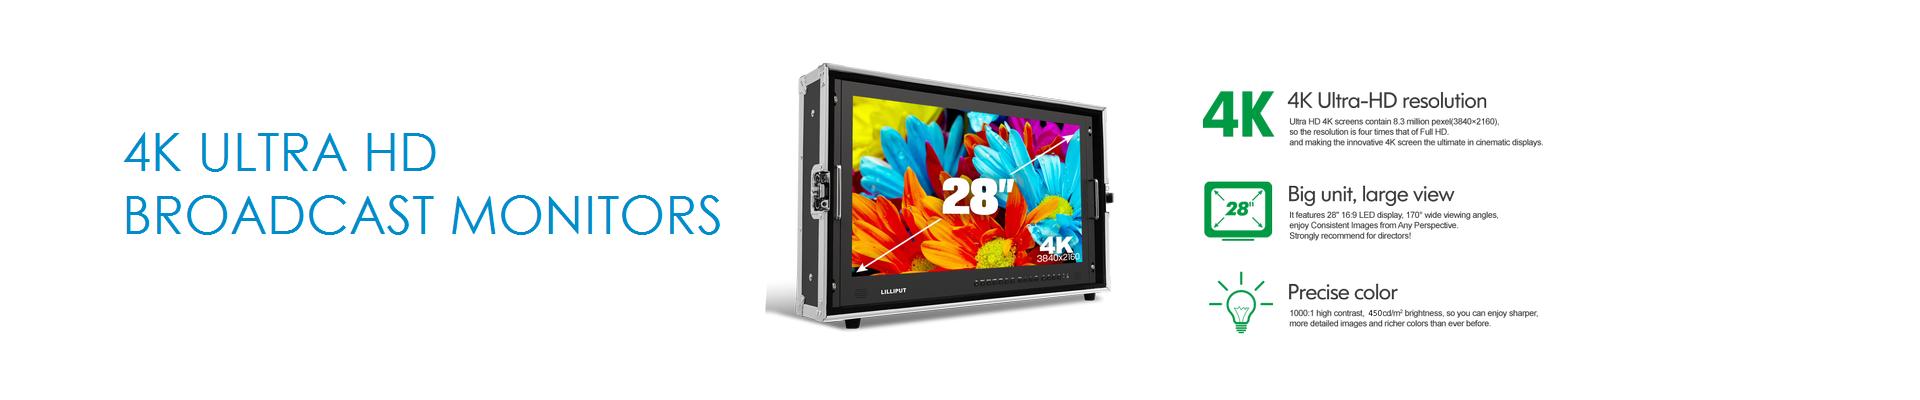 4K Broadcast Monitor